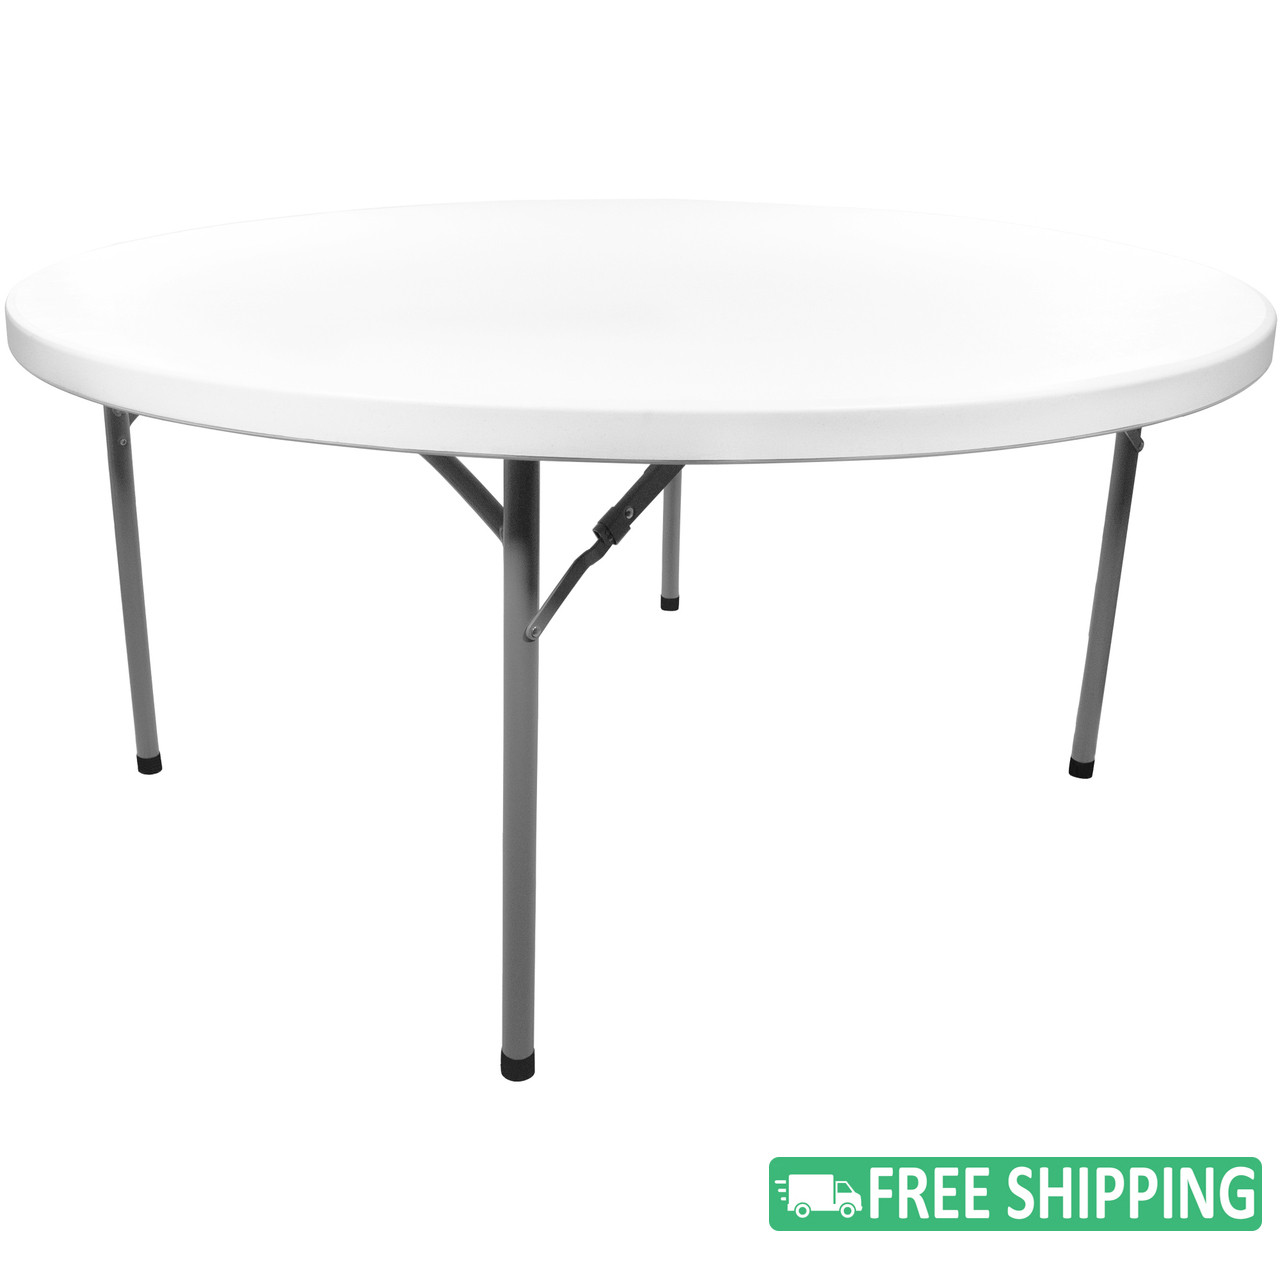 Pleasing 10 Pack Advantage 5 Ft Round White Plastic Folding Table Adv60R White 10 White Granite Download Free Architecture Designs Scobabritishbridgeorg